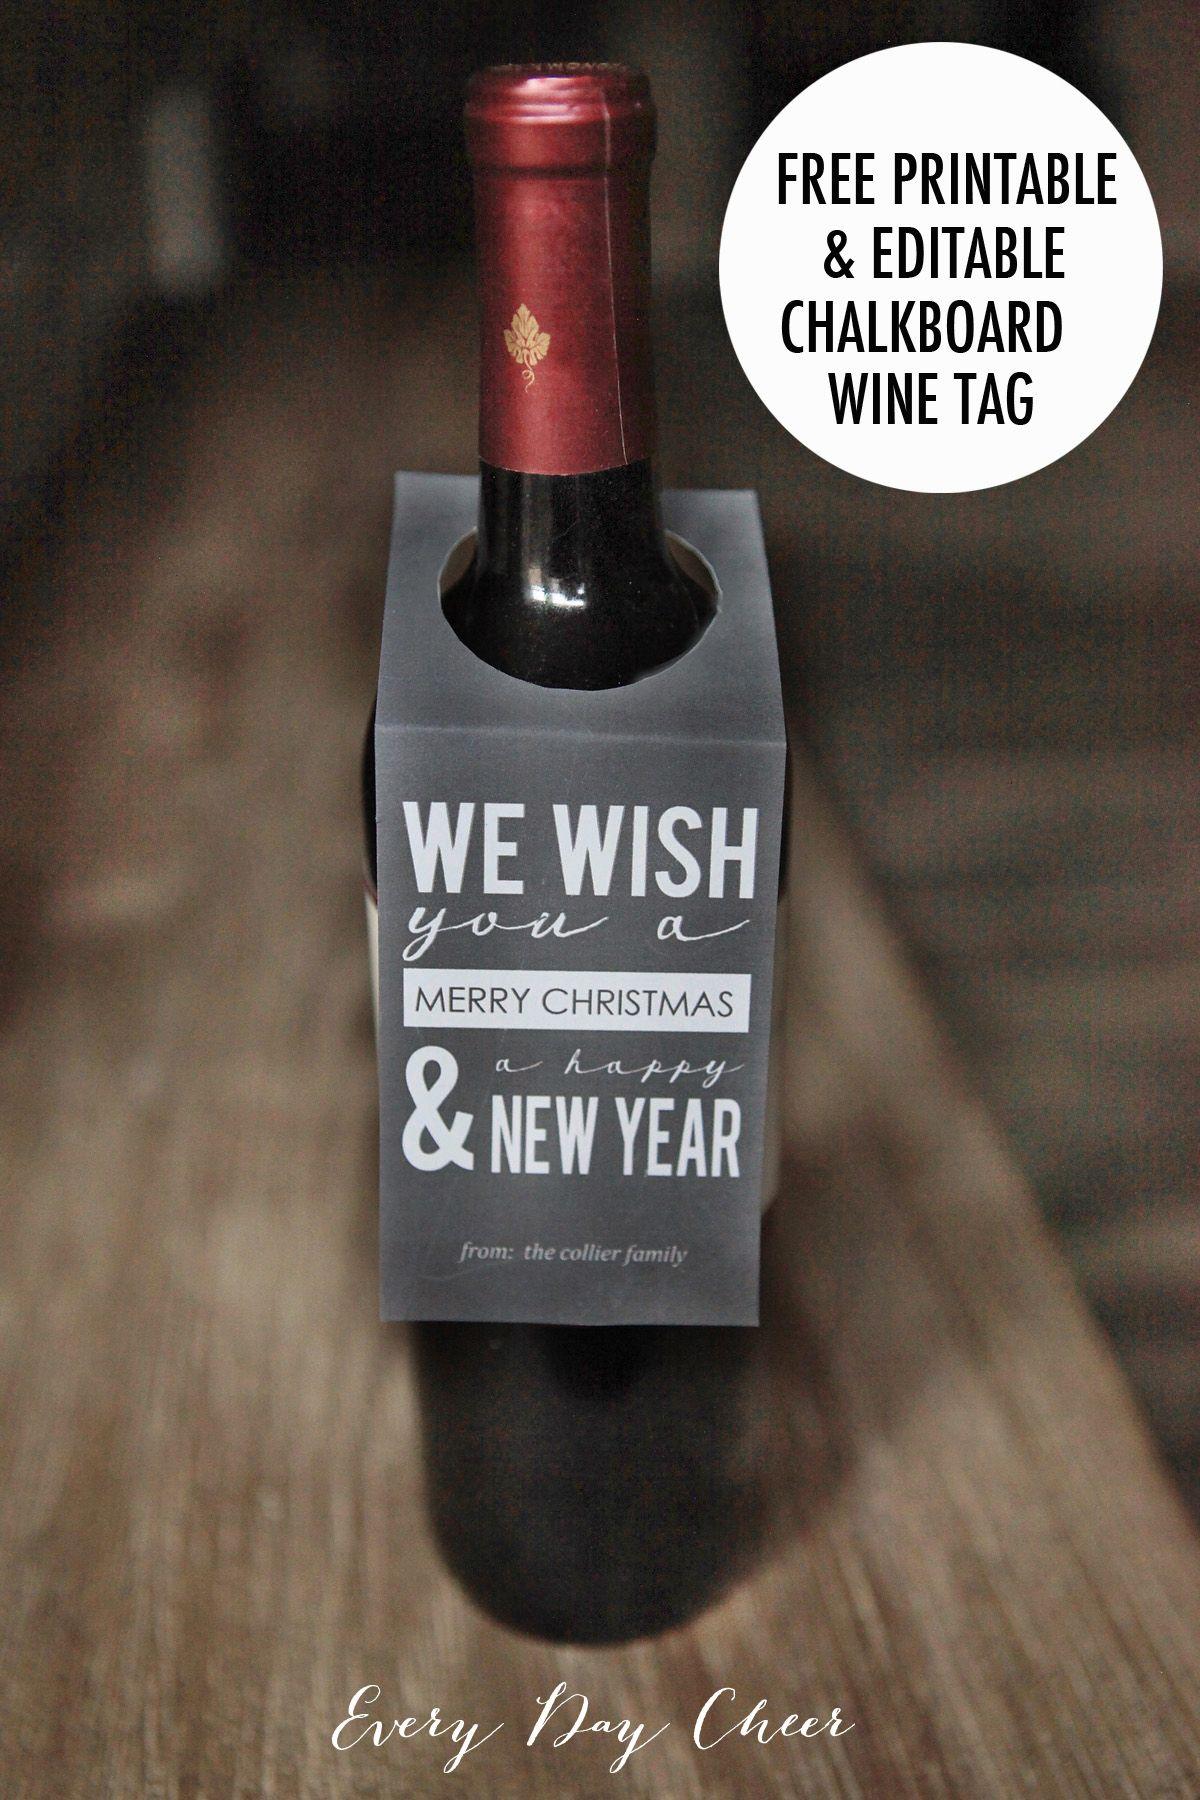 Printable Holiday Wine Tag - http://everydaycheer.com/2013/12/11/printable-holiday-wine-tag/